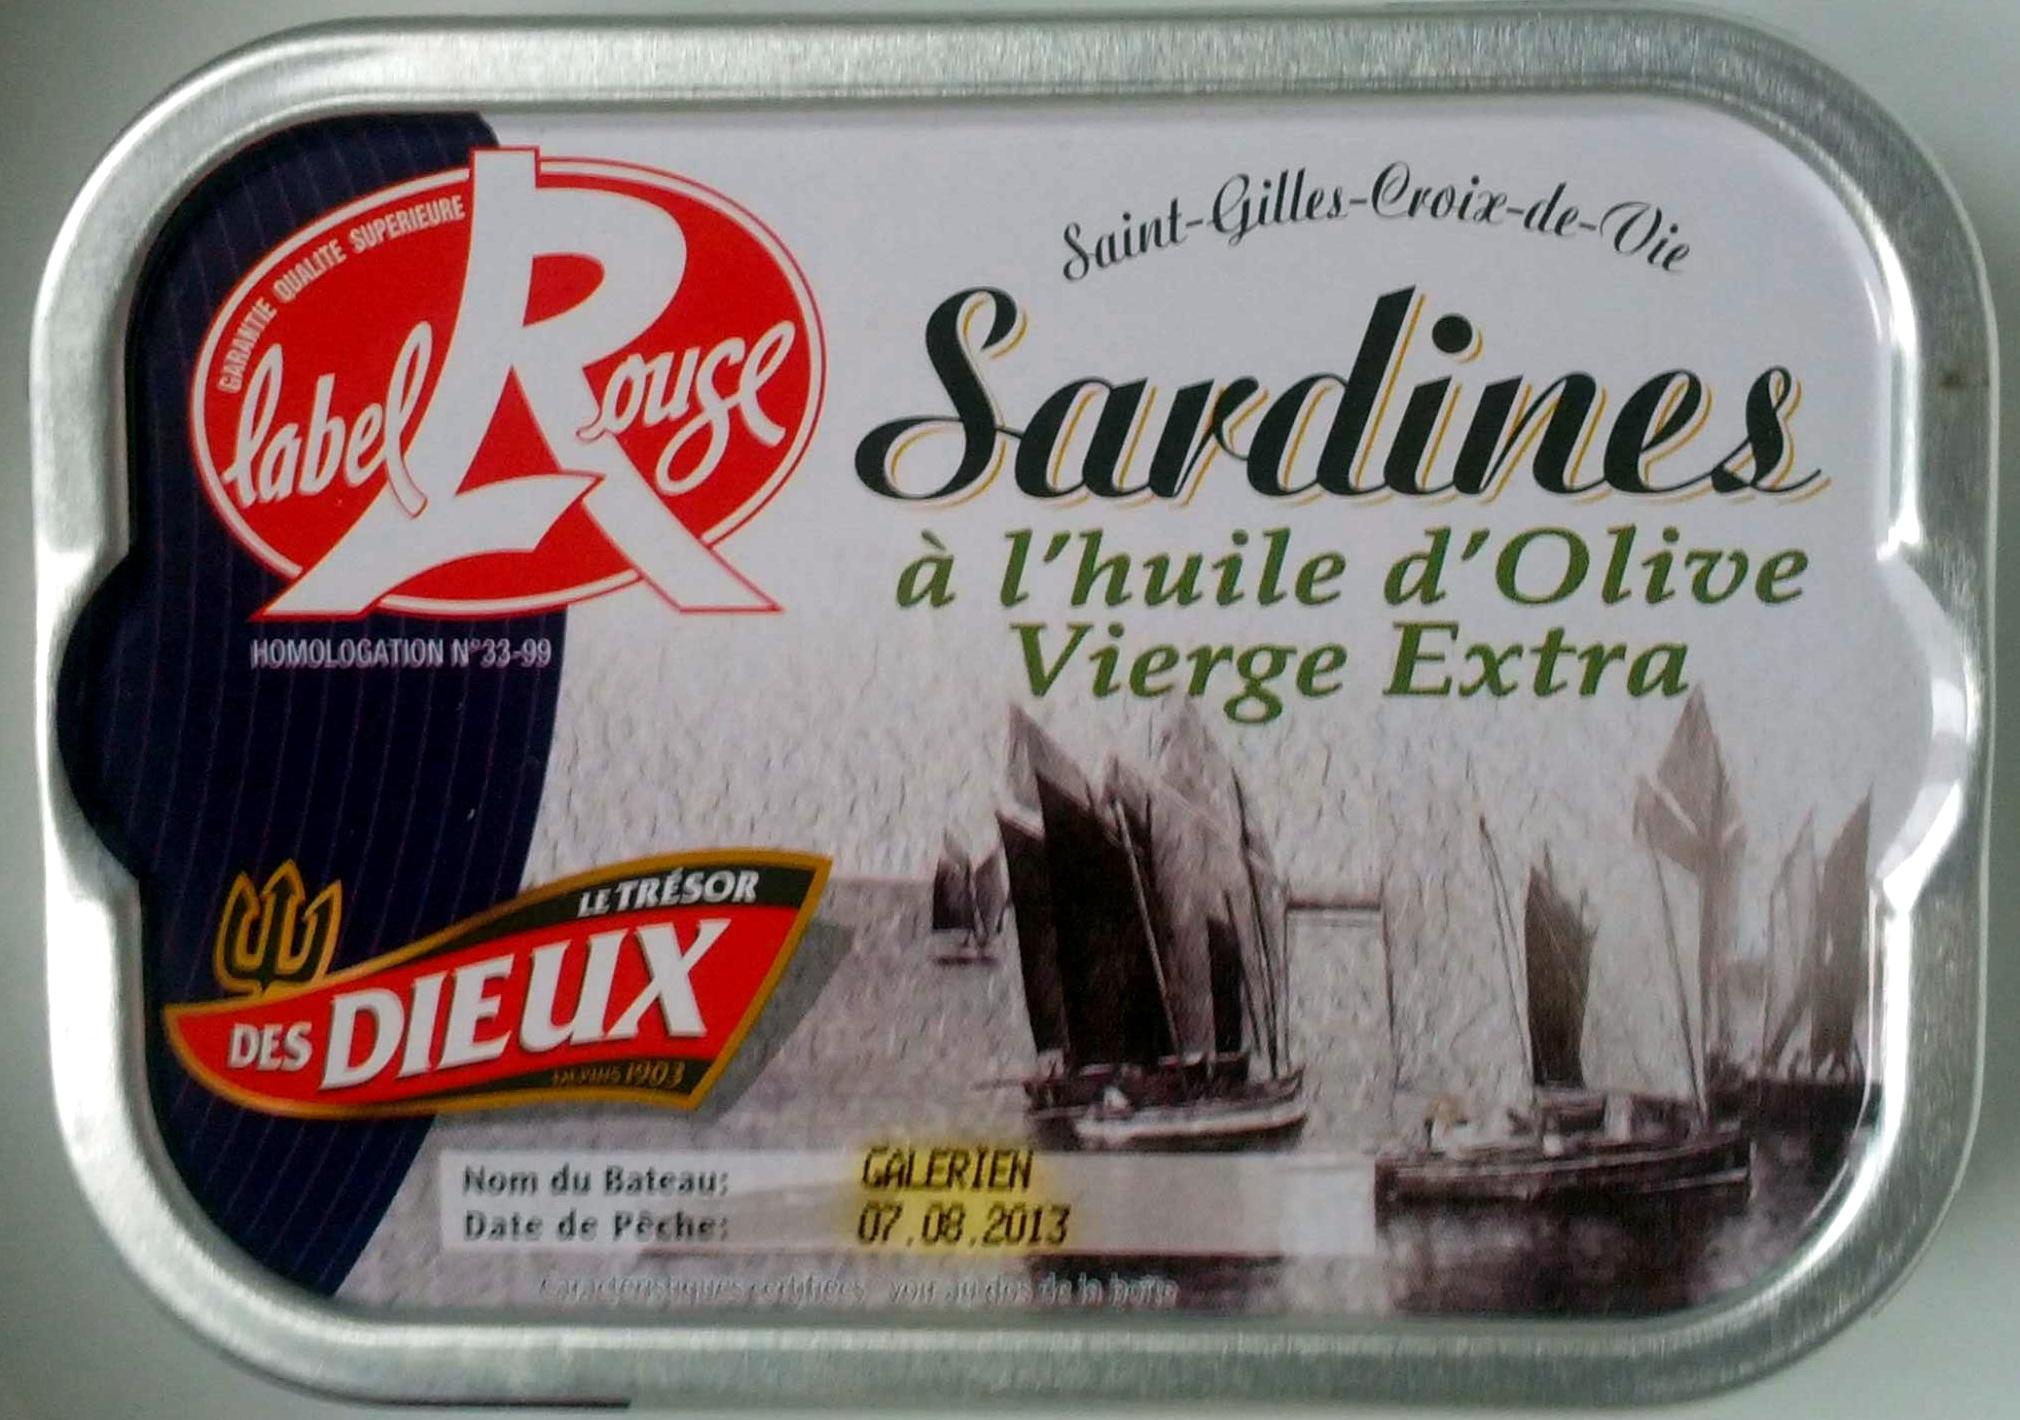 Sardines à l'huile d'Olive Vierge Extra (Label Rouge) - Product